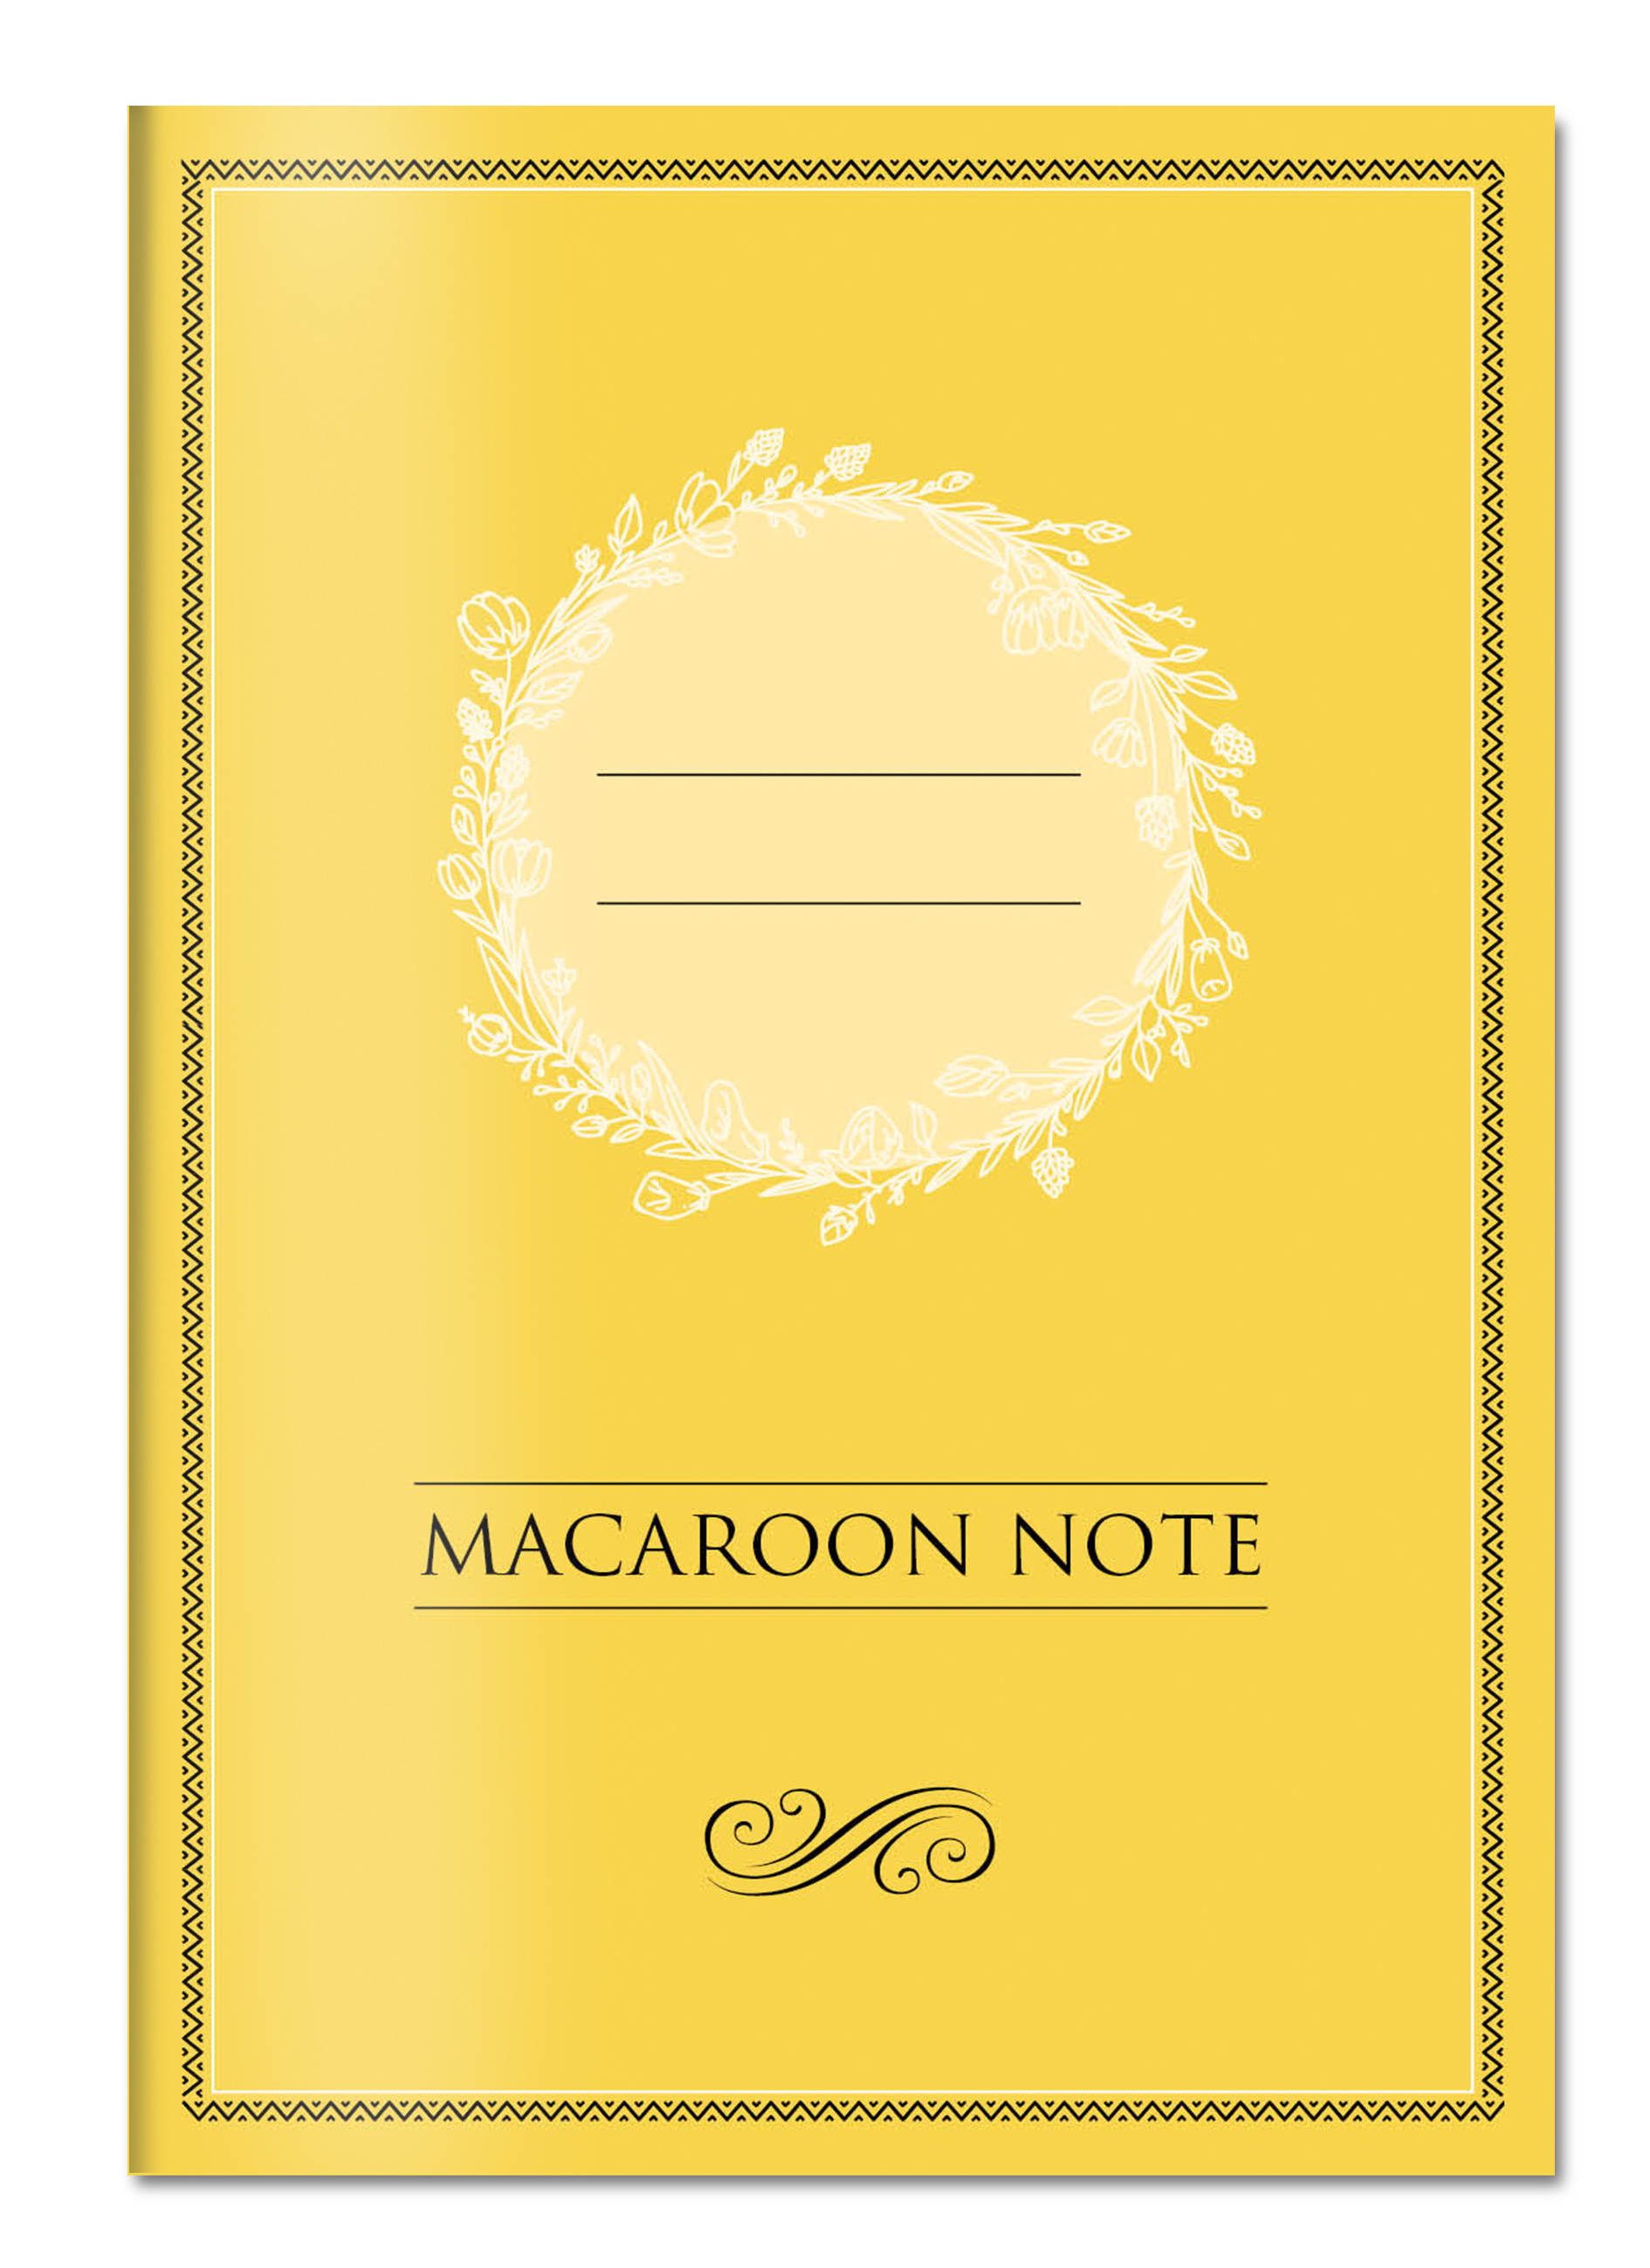 Блокнот с цветными страницами (лимон, мягкая обложка, линовка, на скобе) цена